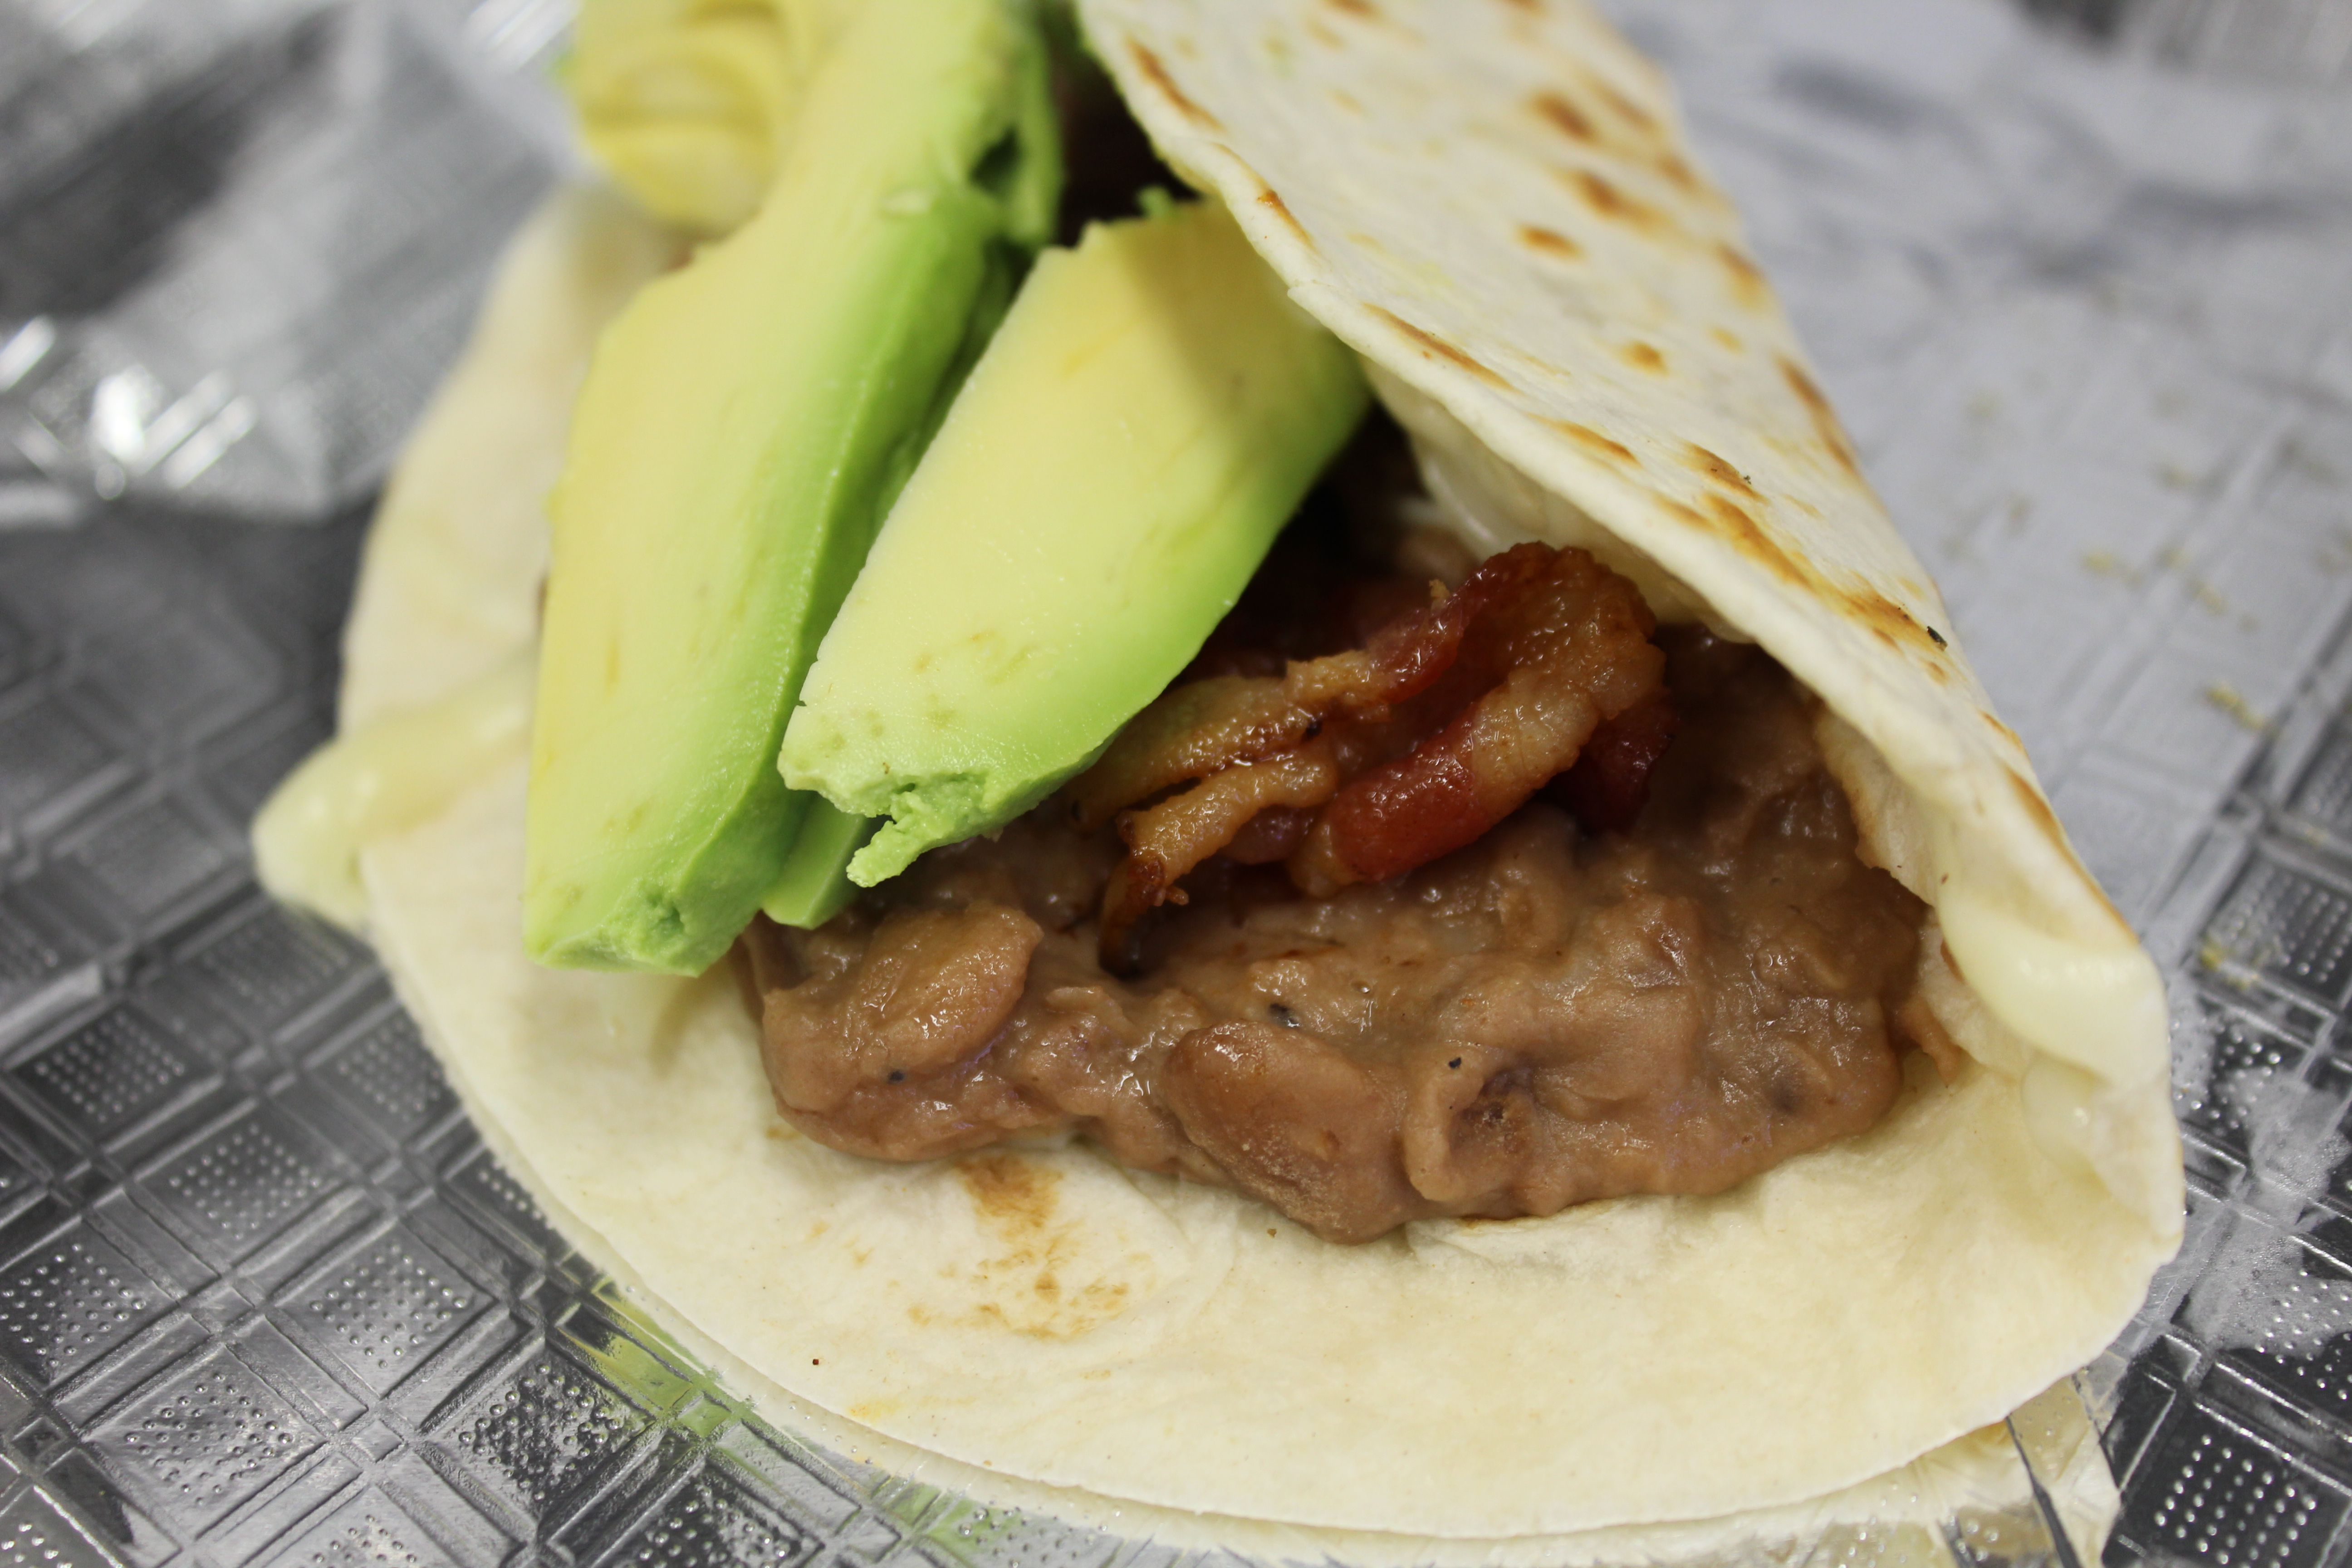 Don Chago taco